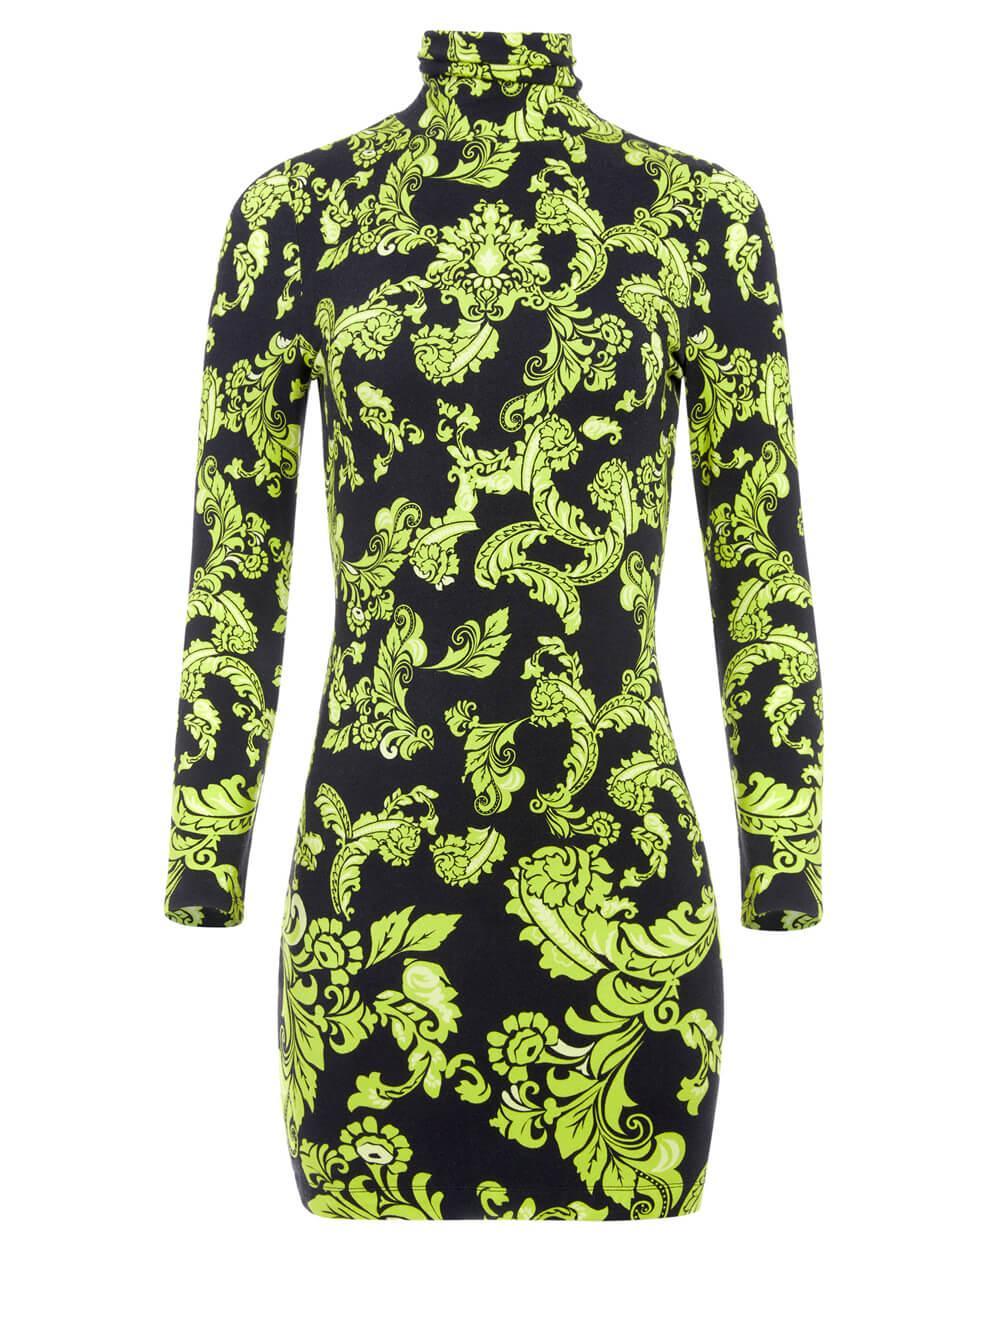 Delora Turtleneck Dress